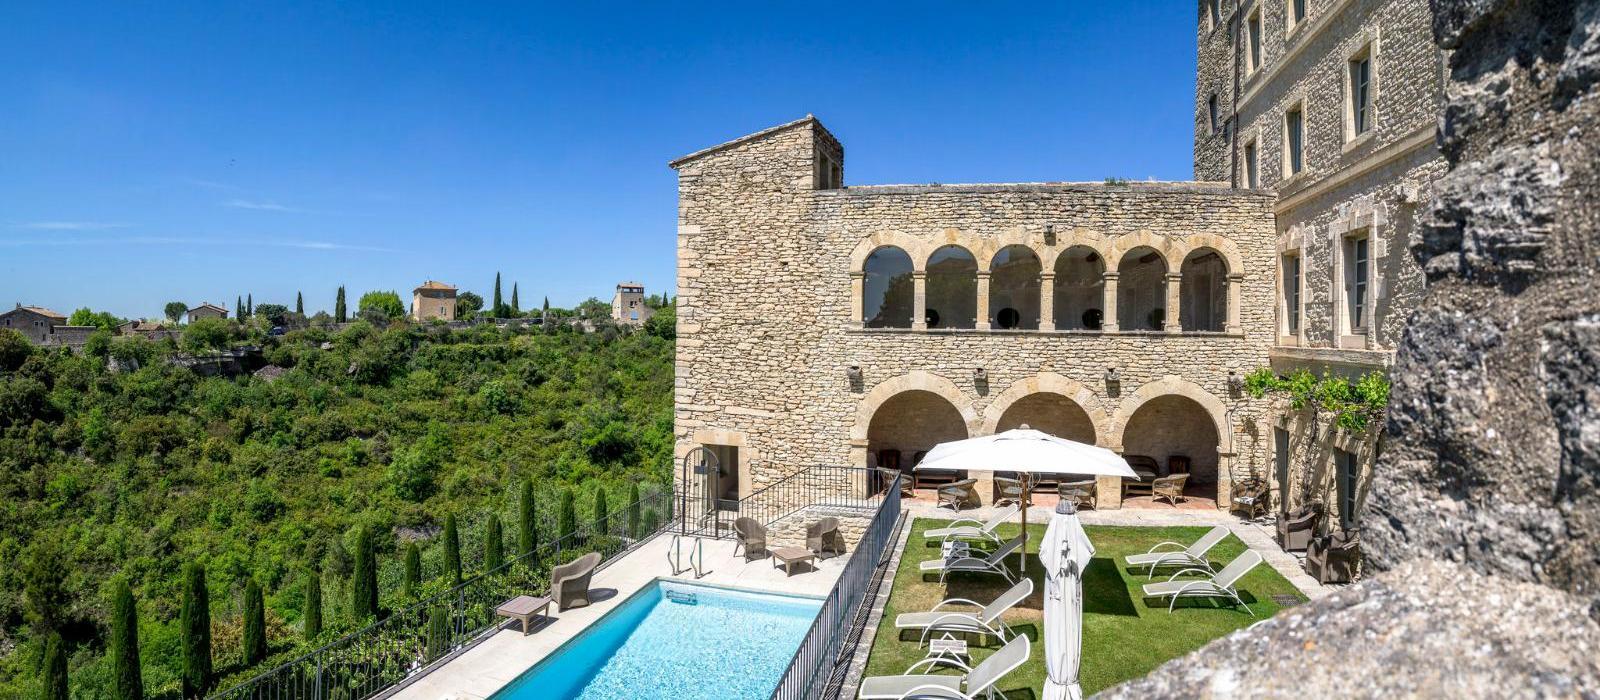 普罗旺斯戈尔德红莓山庄酒店(Airelles Gordes, La Bastide) 图片  www.lhw.cn